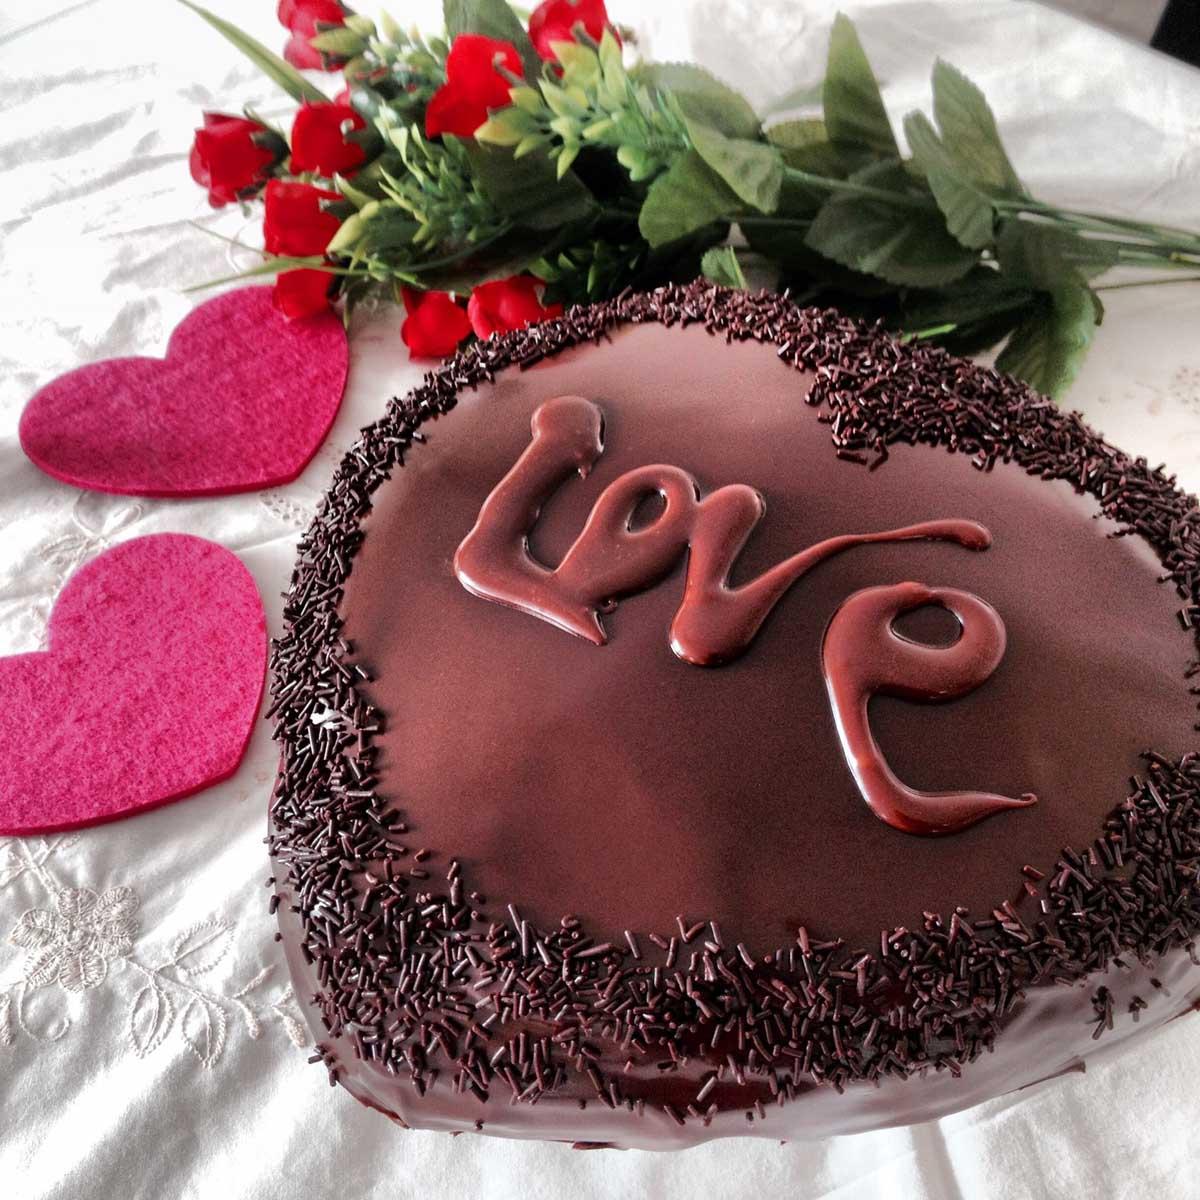 Tarta corazón de chocolate sin lactosa San Valentín